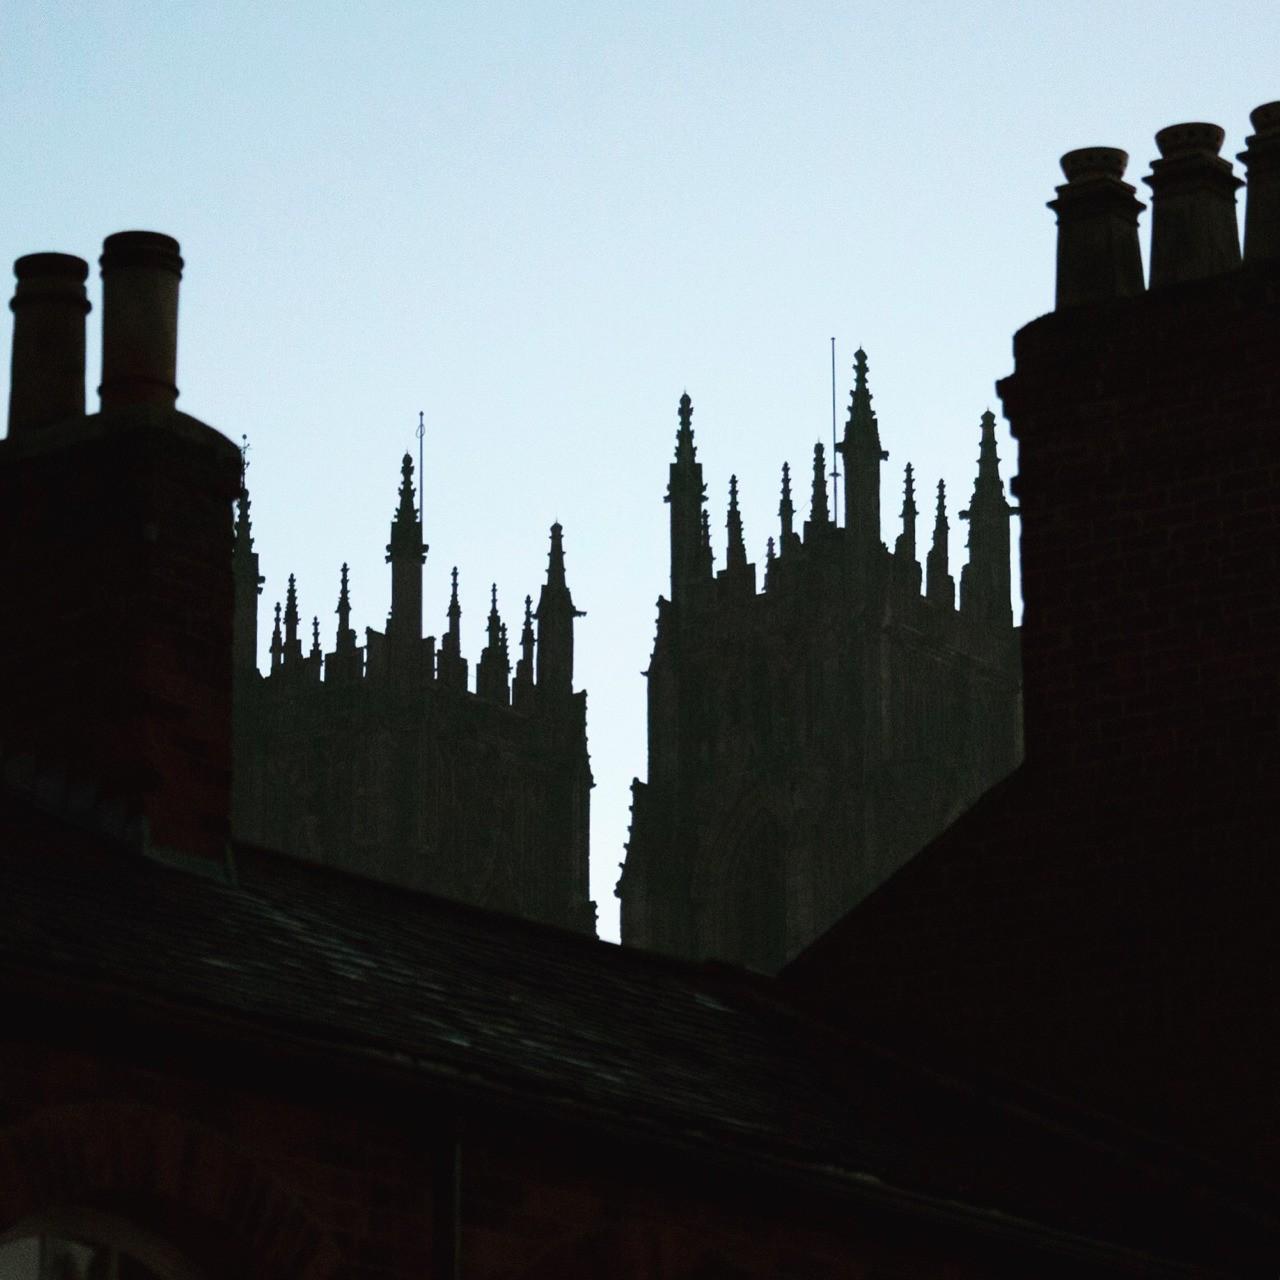 Roof top silhouette, Beverley, Yorkshire, UK - follow me on Instagram: @fotofacade